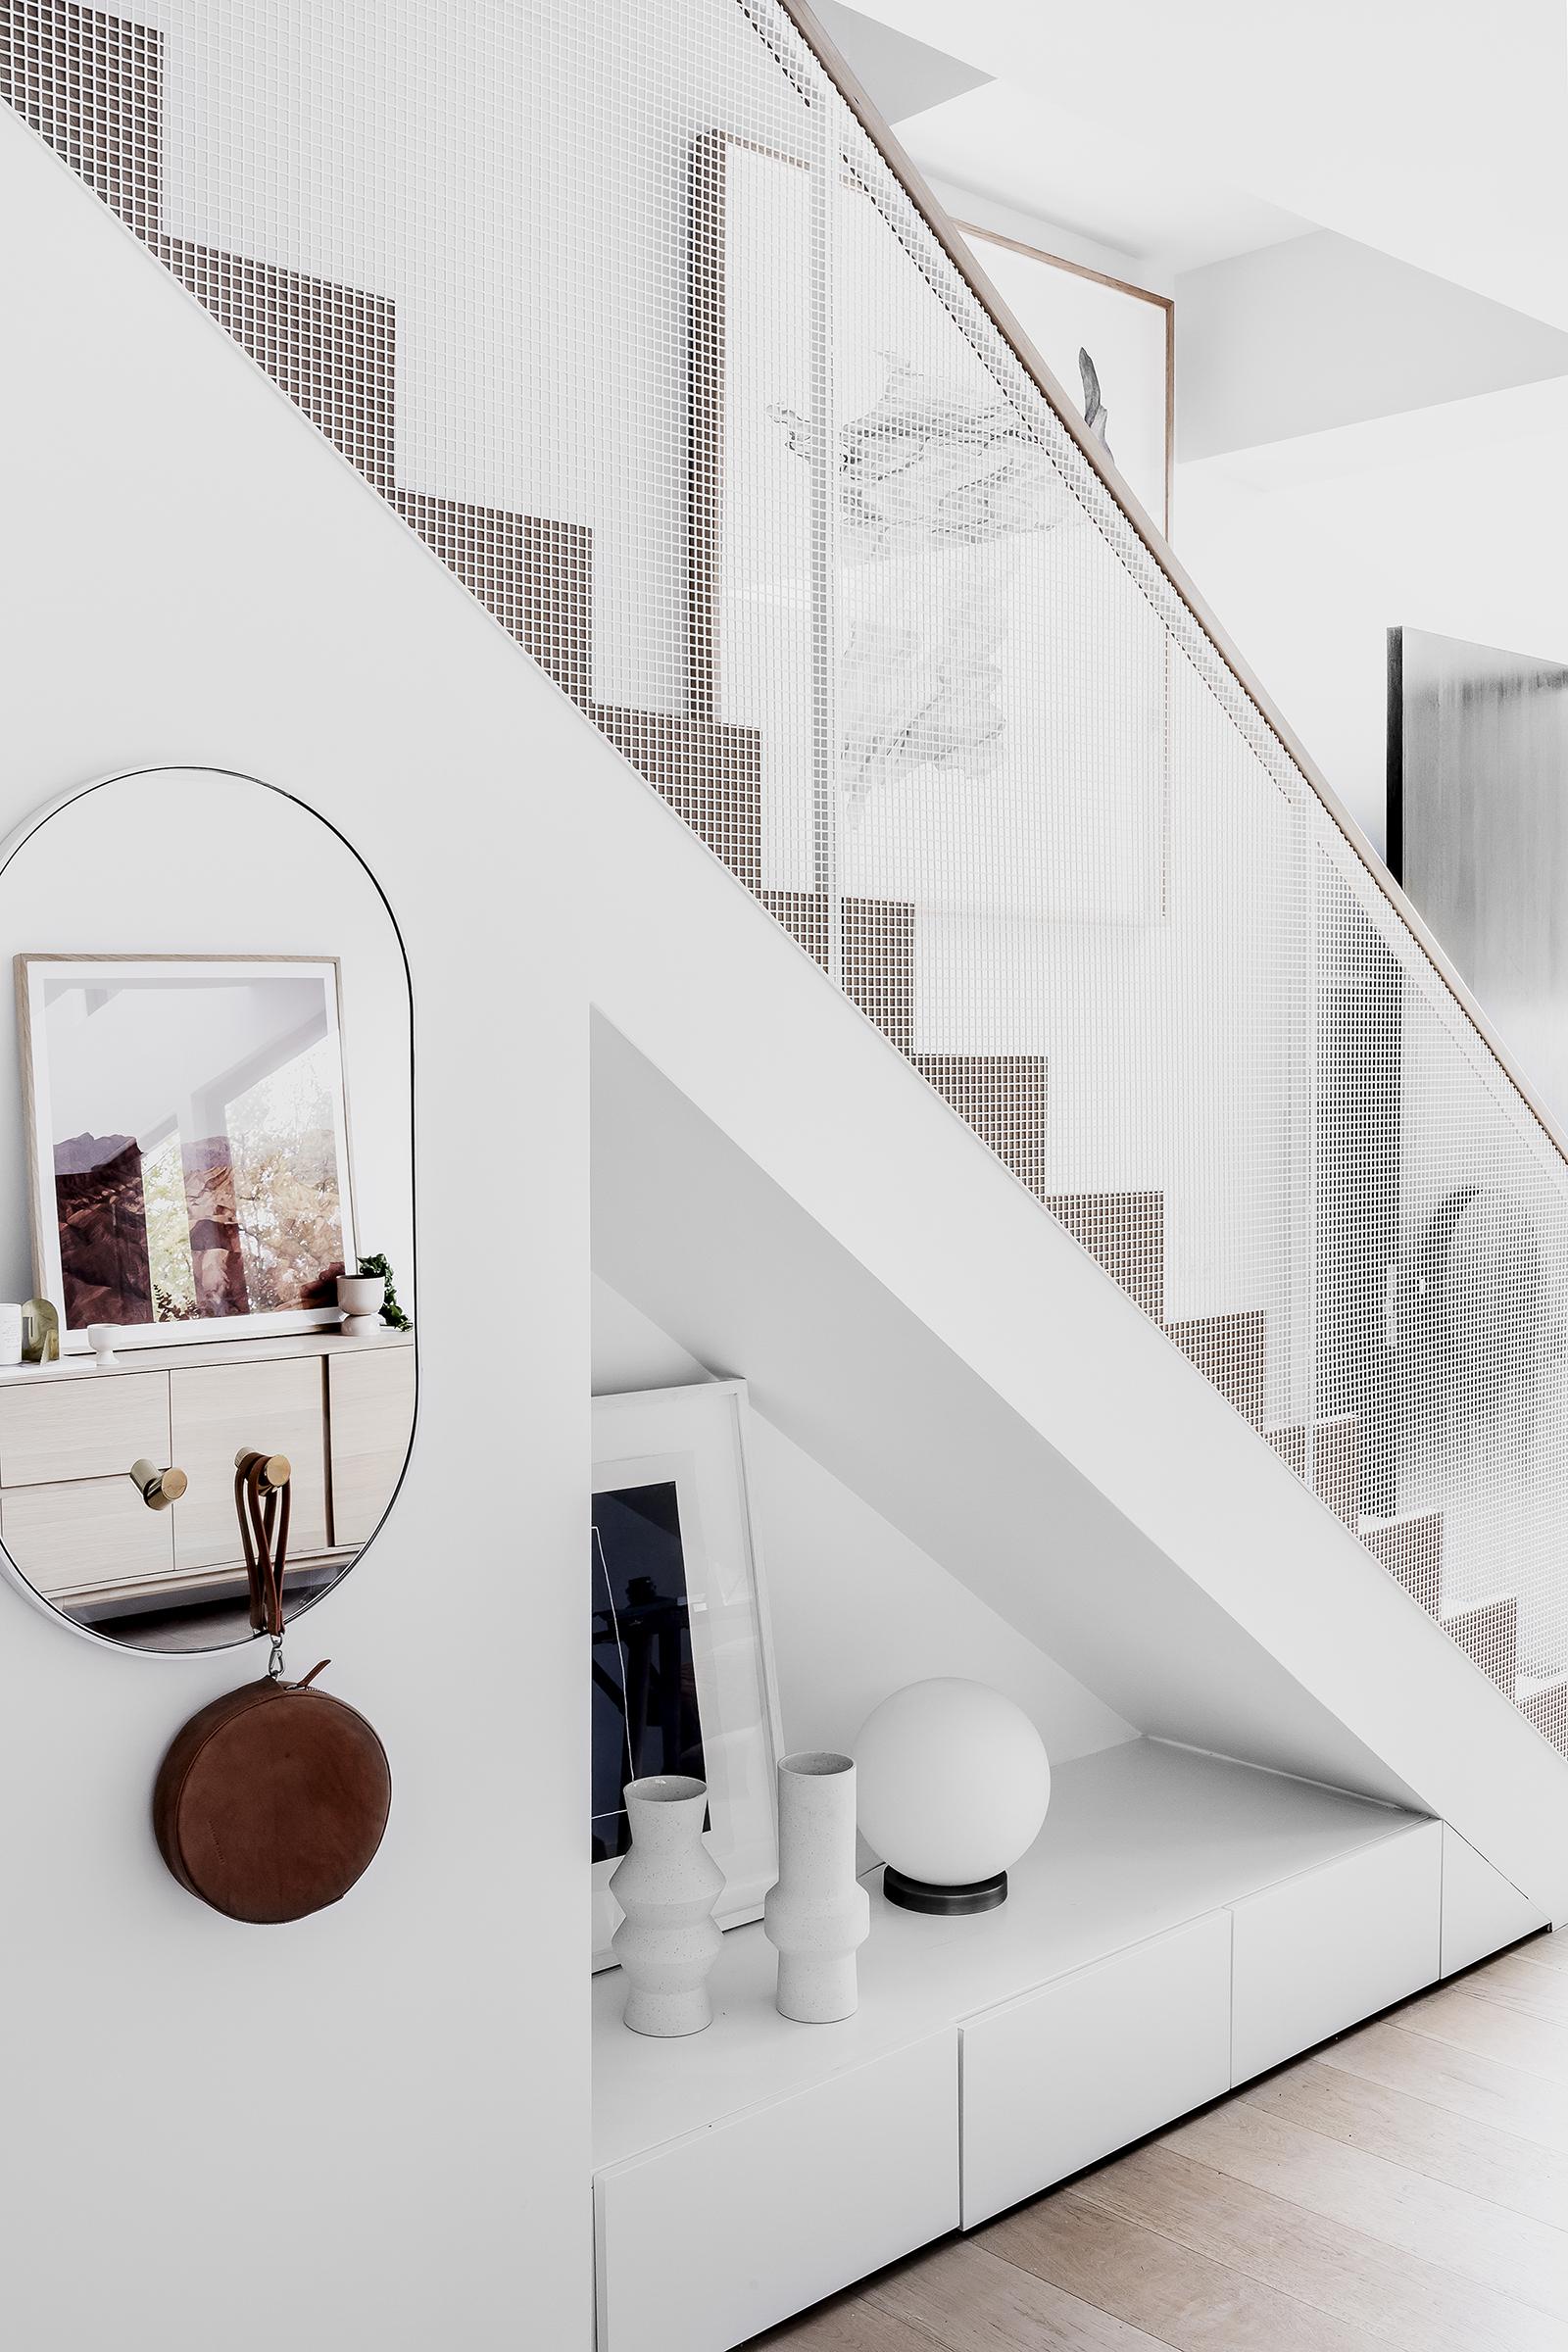 Photography  Maegan Brown /  Interior Design  The Stella Collective /  Architecture  Cera Stribley Architects